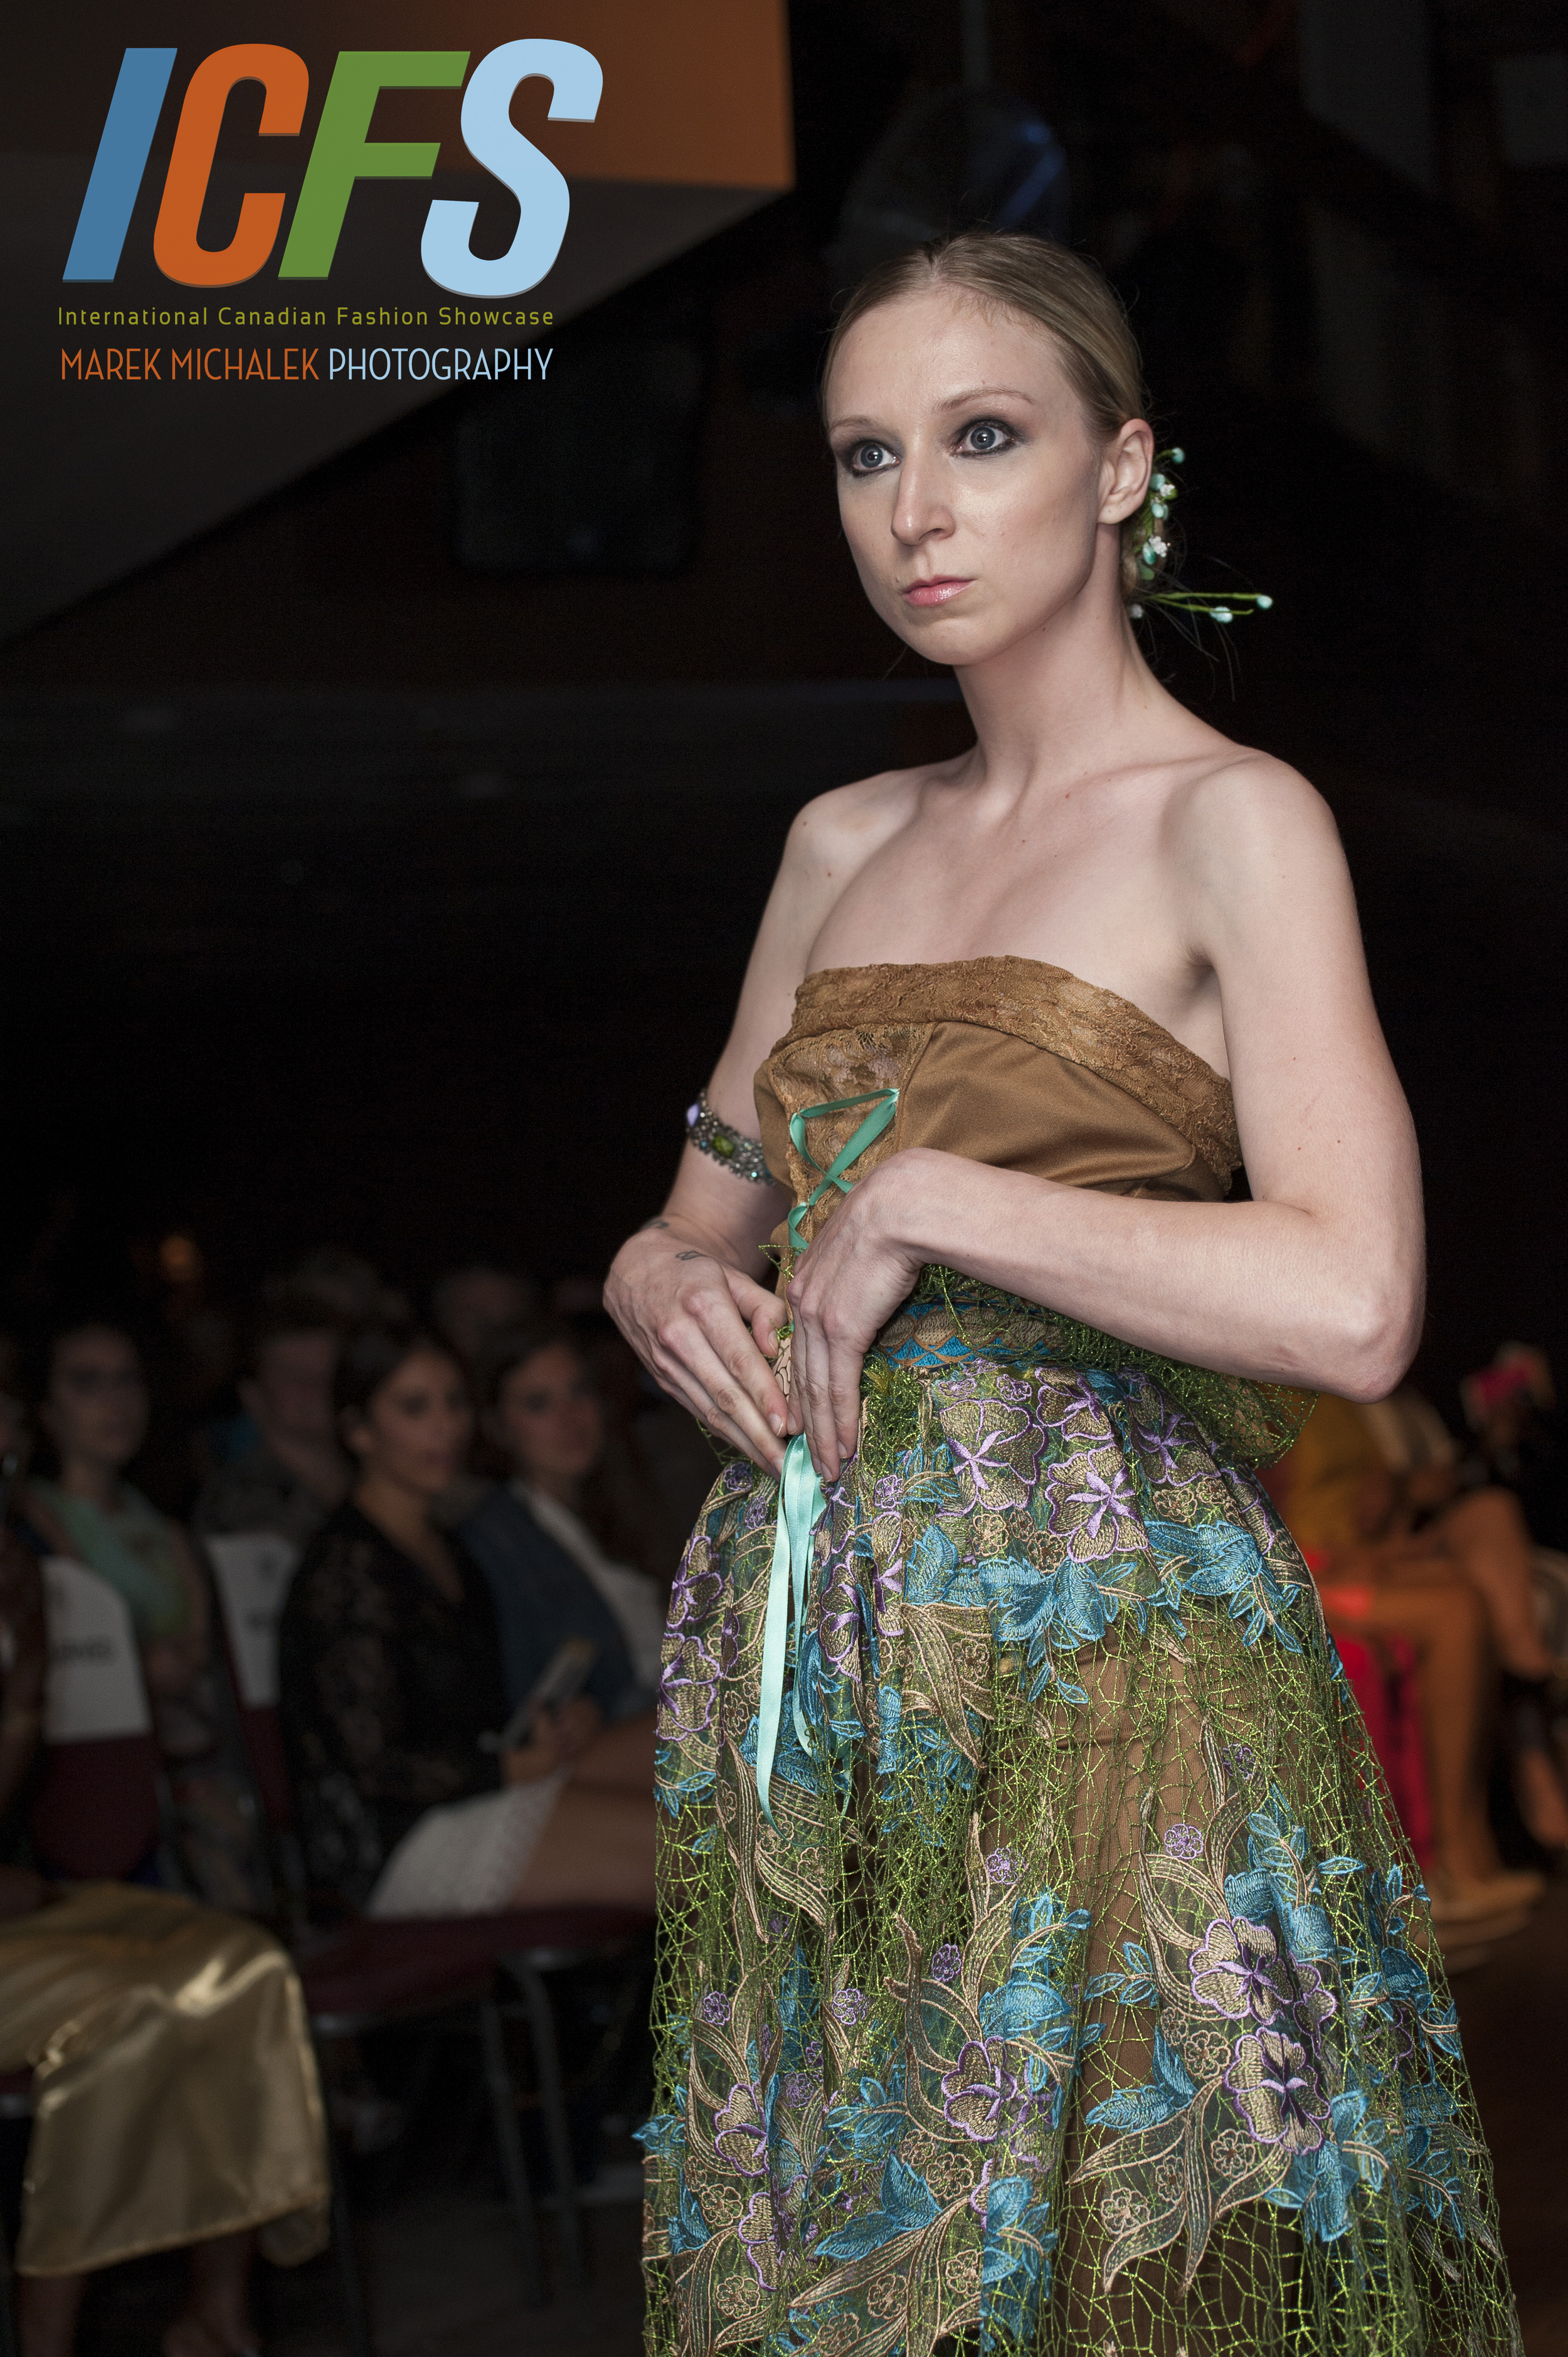 International Canadian Fashion Showcase - Marek Michalek copy.jpg